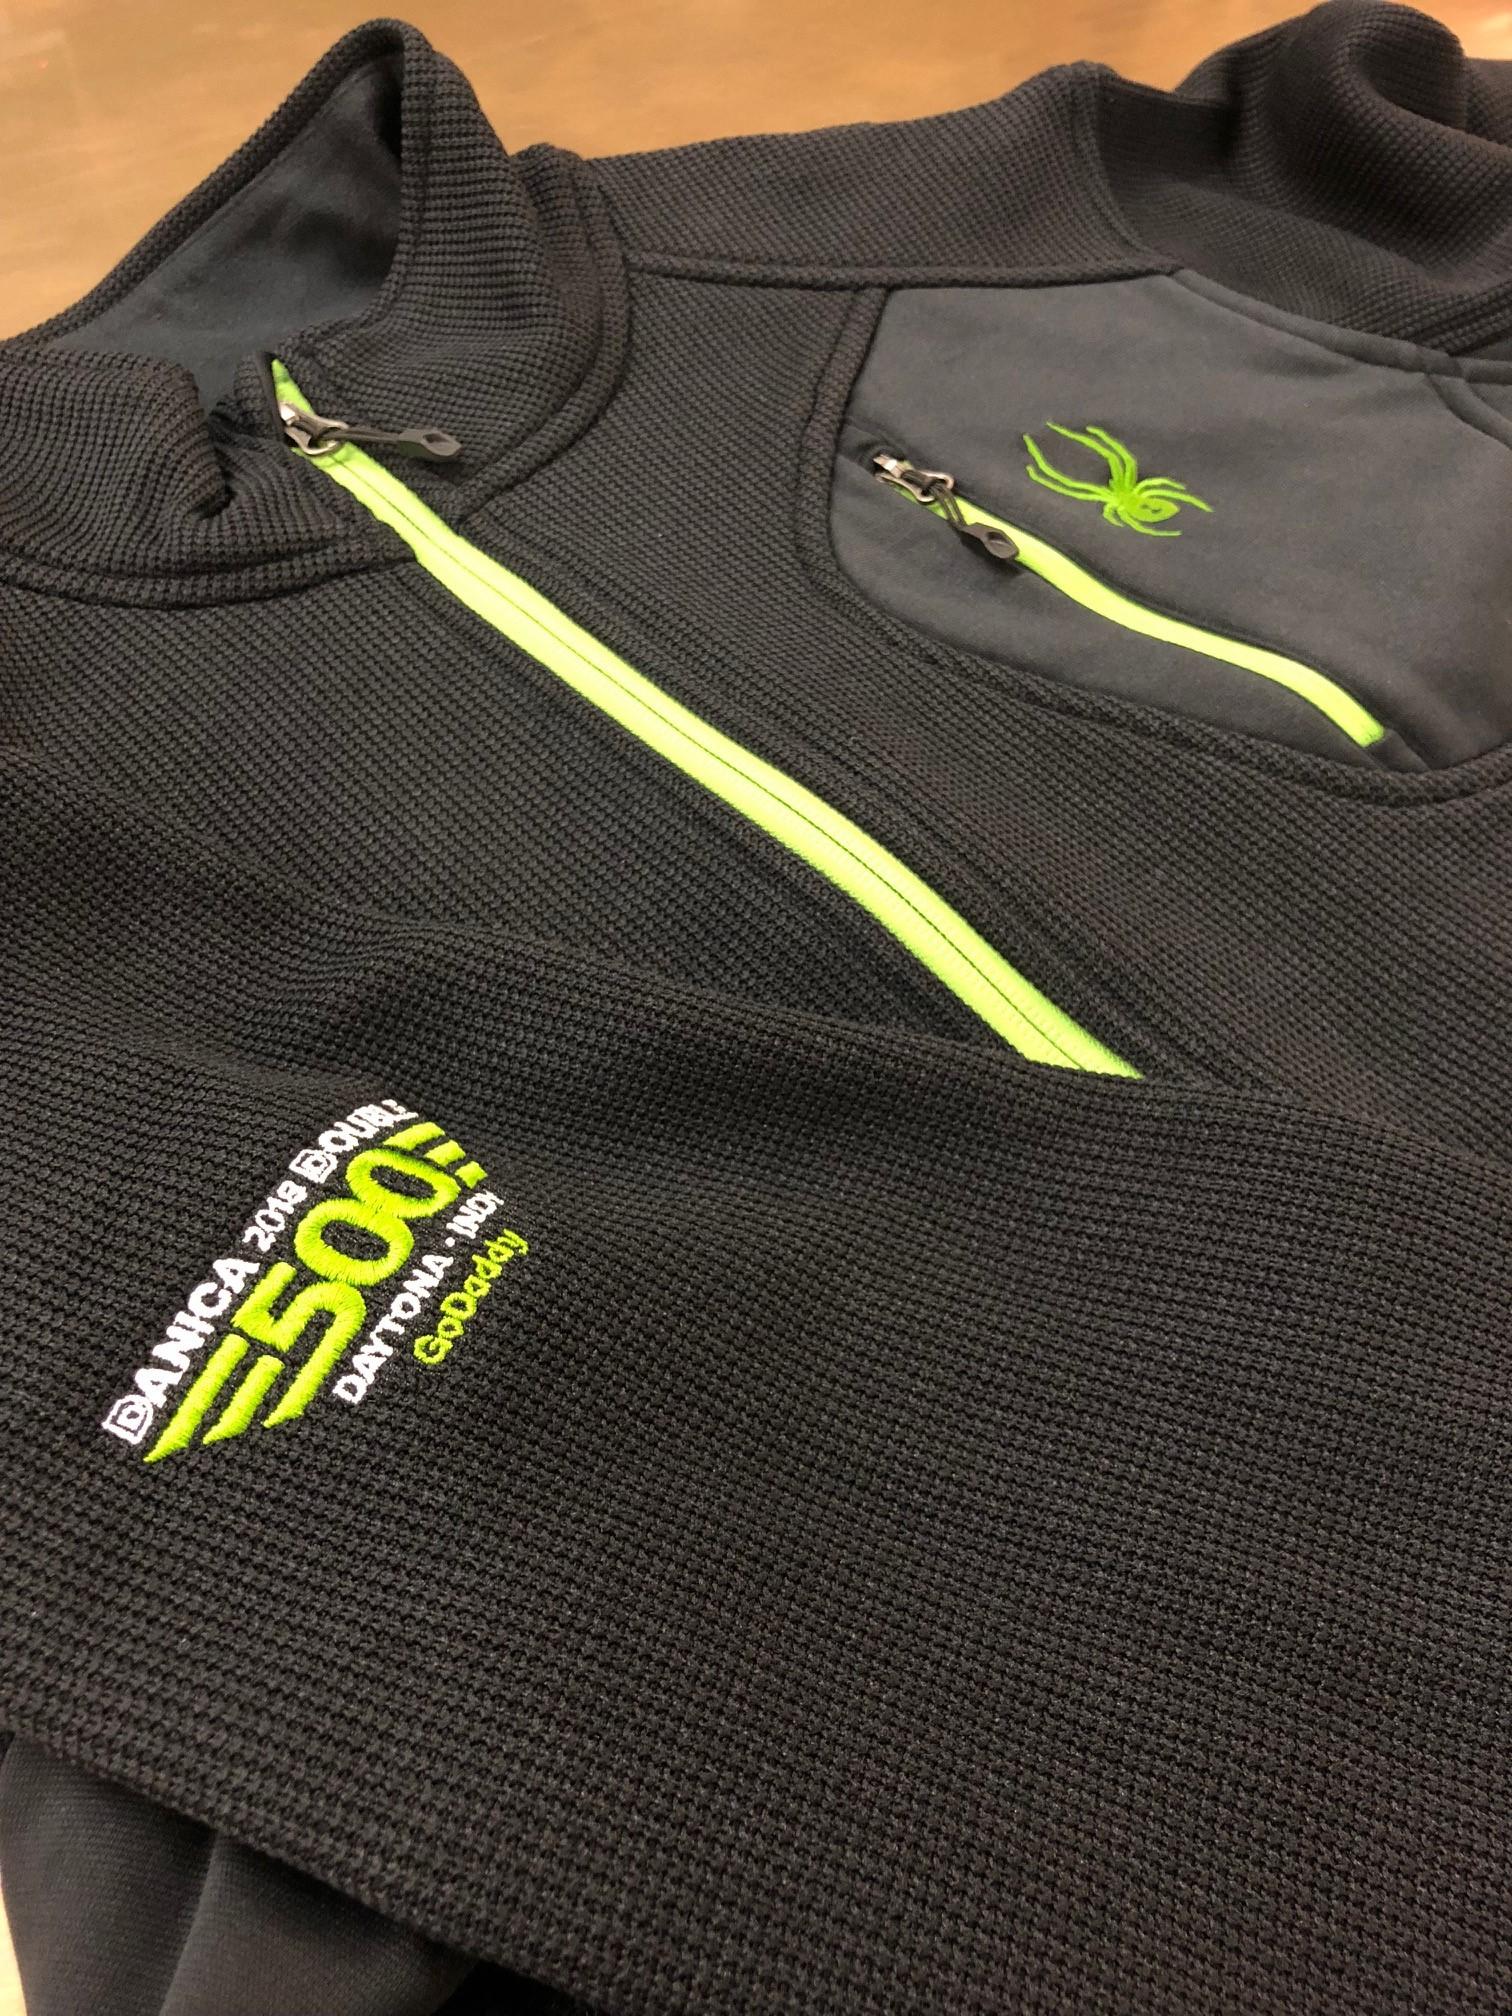 logounltd_laser_etching_embroidery_screen_printing_corporate_apparel_uniform_custom_tshirts_uniforms_dye_sublimation_kirkland_bellevue_seattle_redmond_branded_merchandise_promotional_products_logo_untd (60).jpg